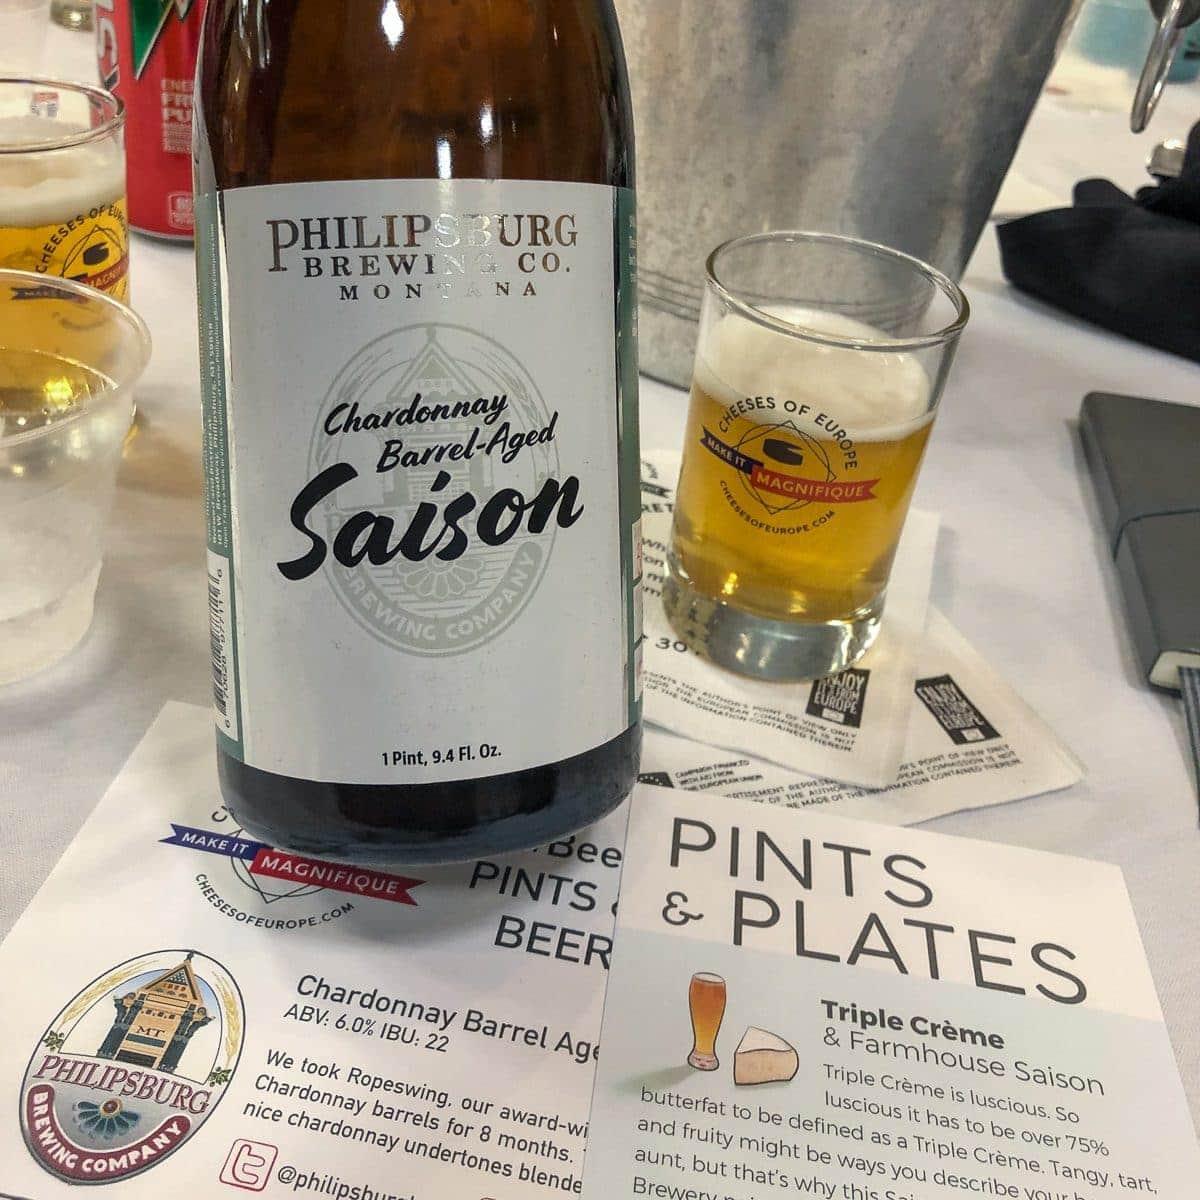 Chardonnay Barrel Aged Saison from Philipsburg Brewing Co in Philipsburg, MT